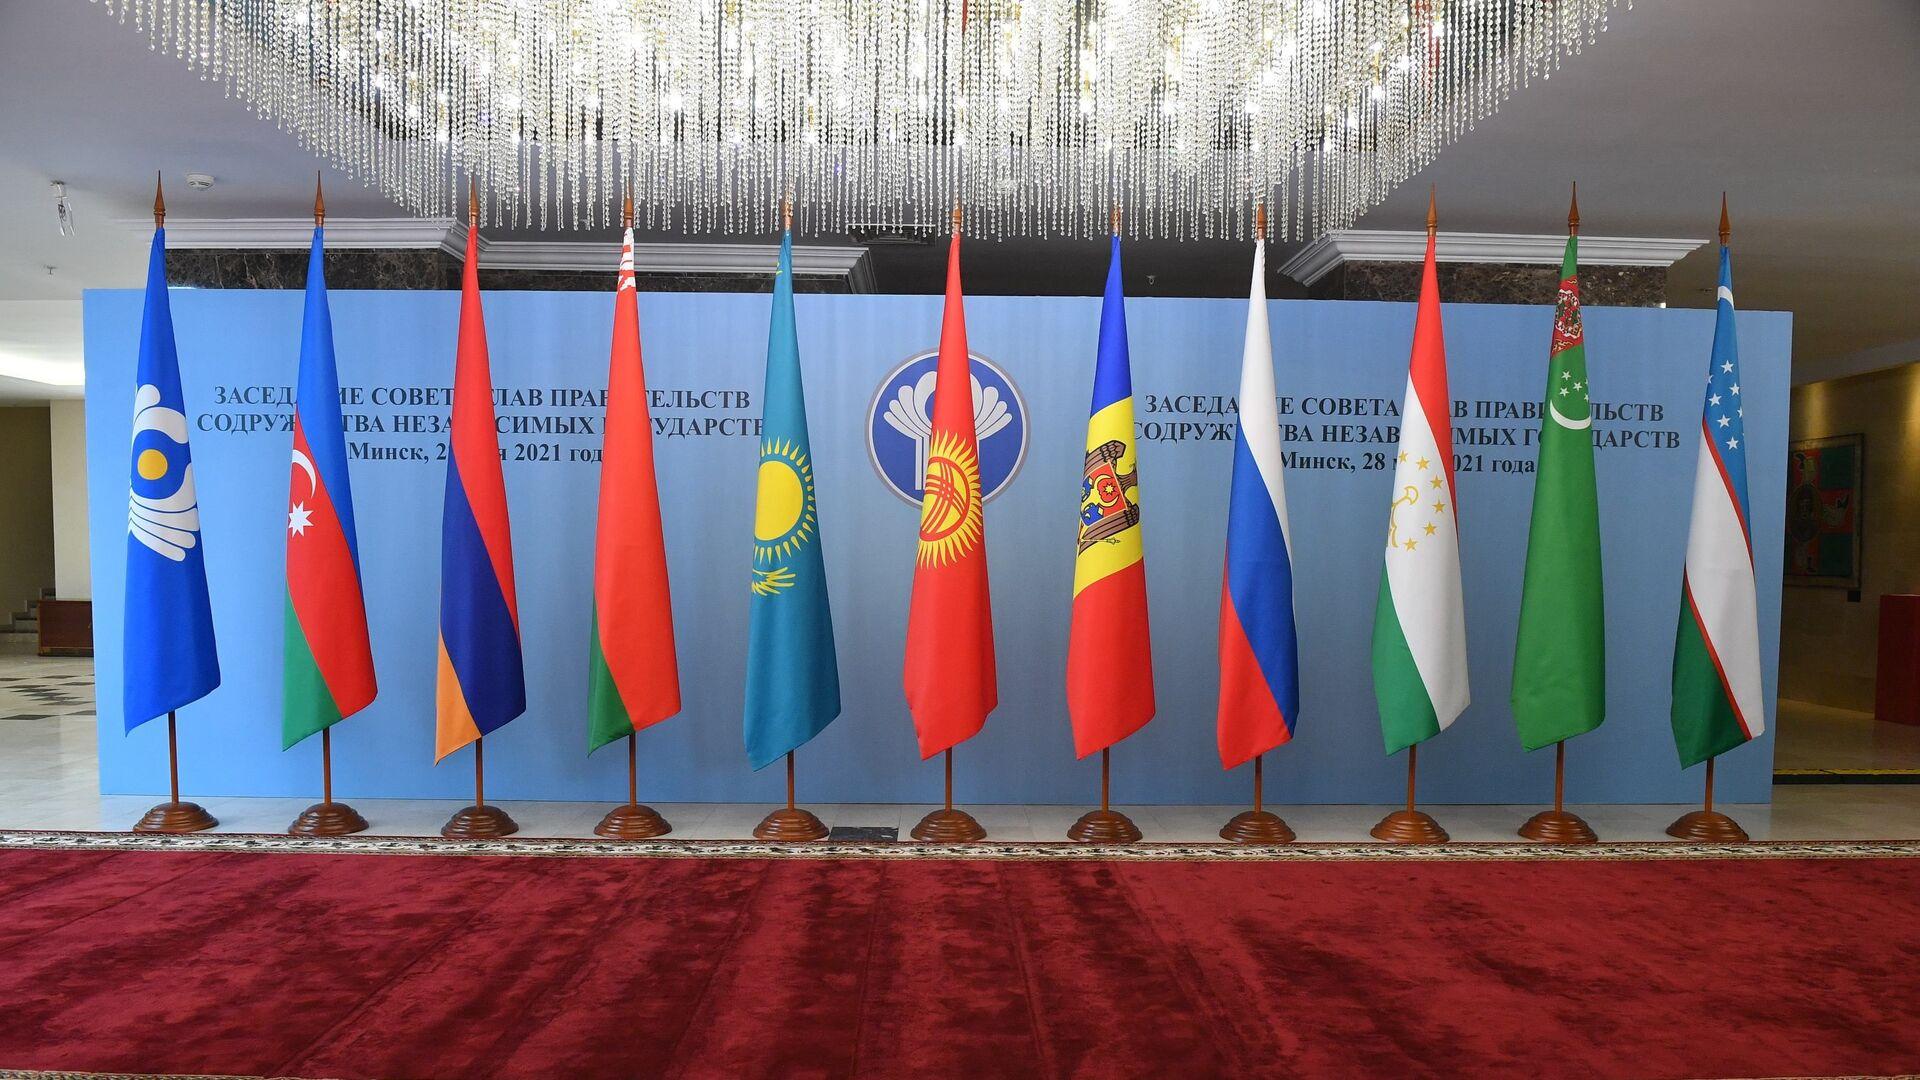 Флаги стран СНАГ на заседании Совета глав правительств СНГ в Минске - Sputnik Азербайджан, 1920, 24.09.2021